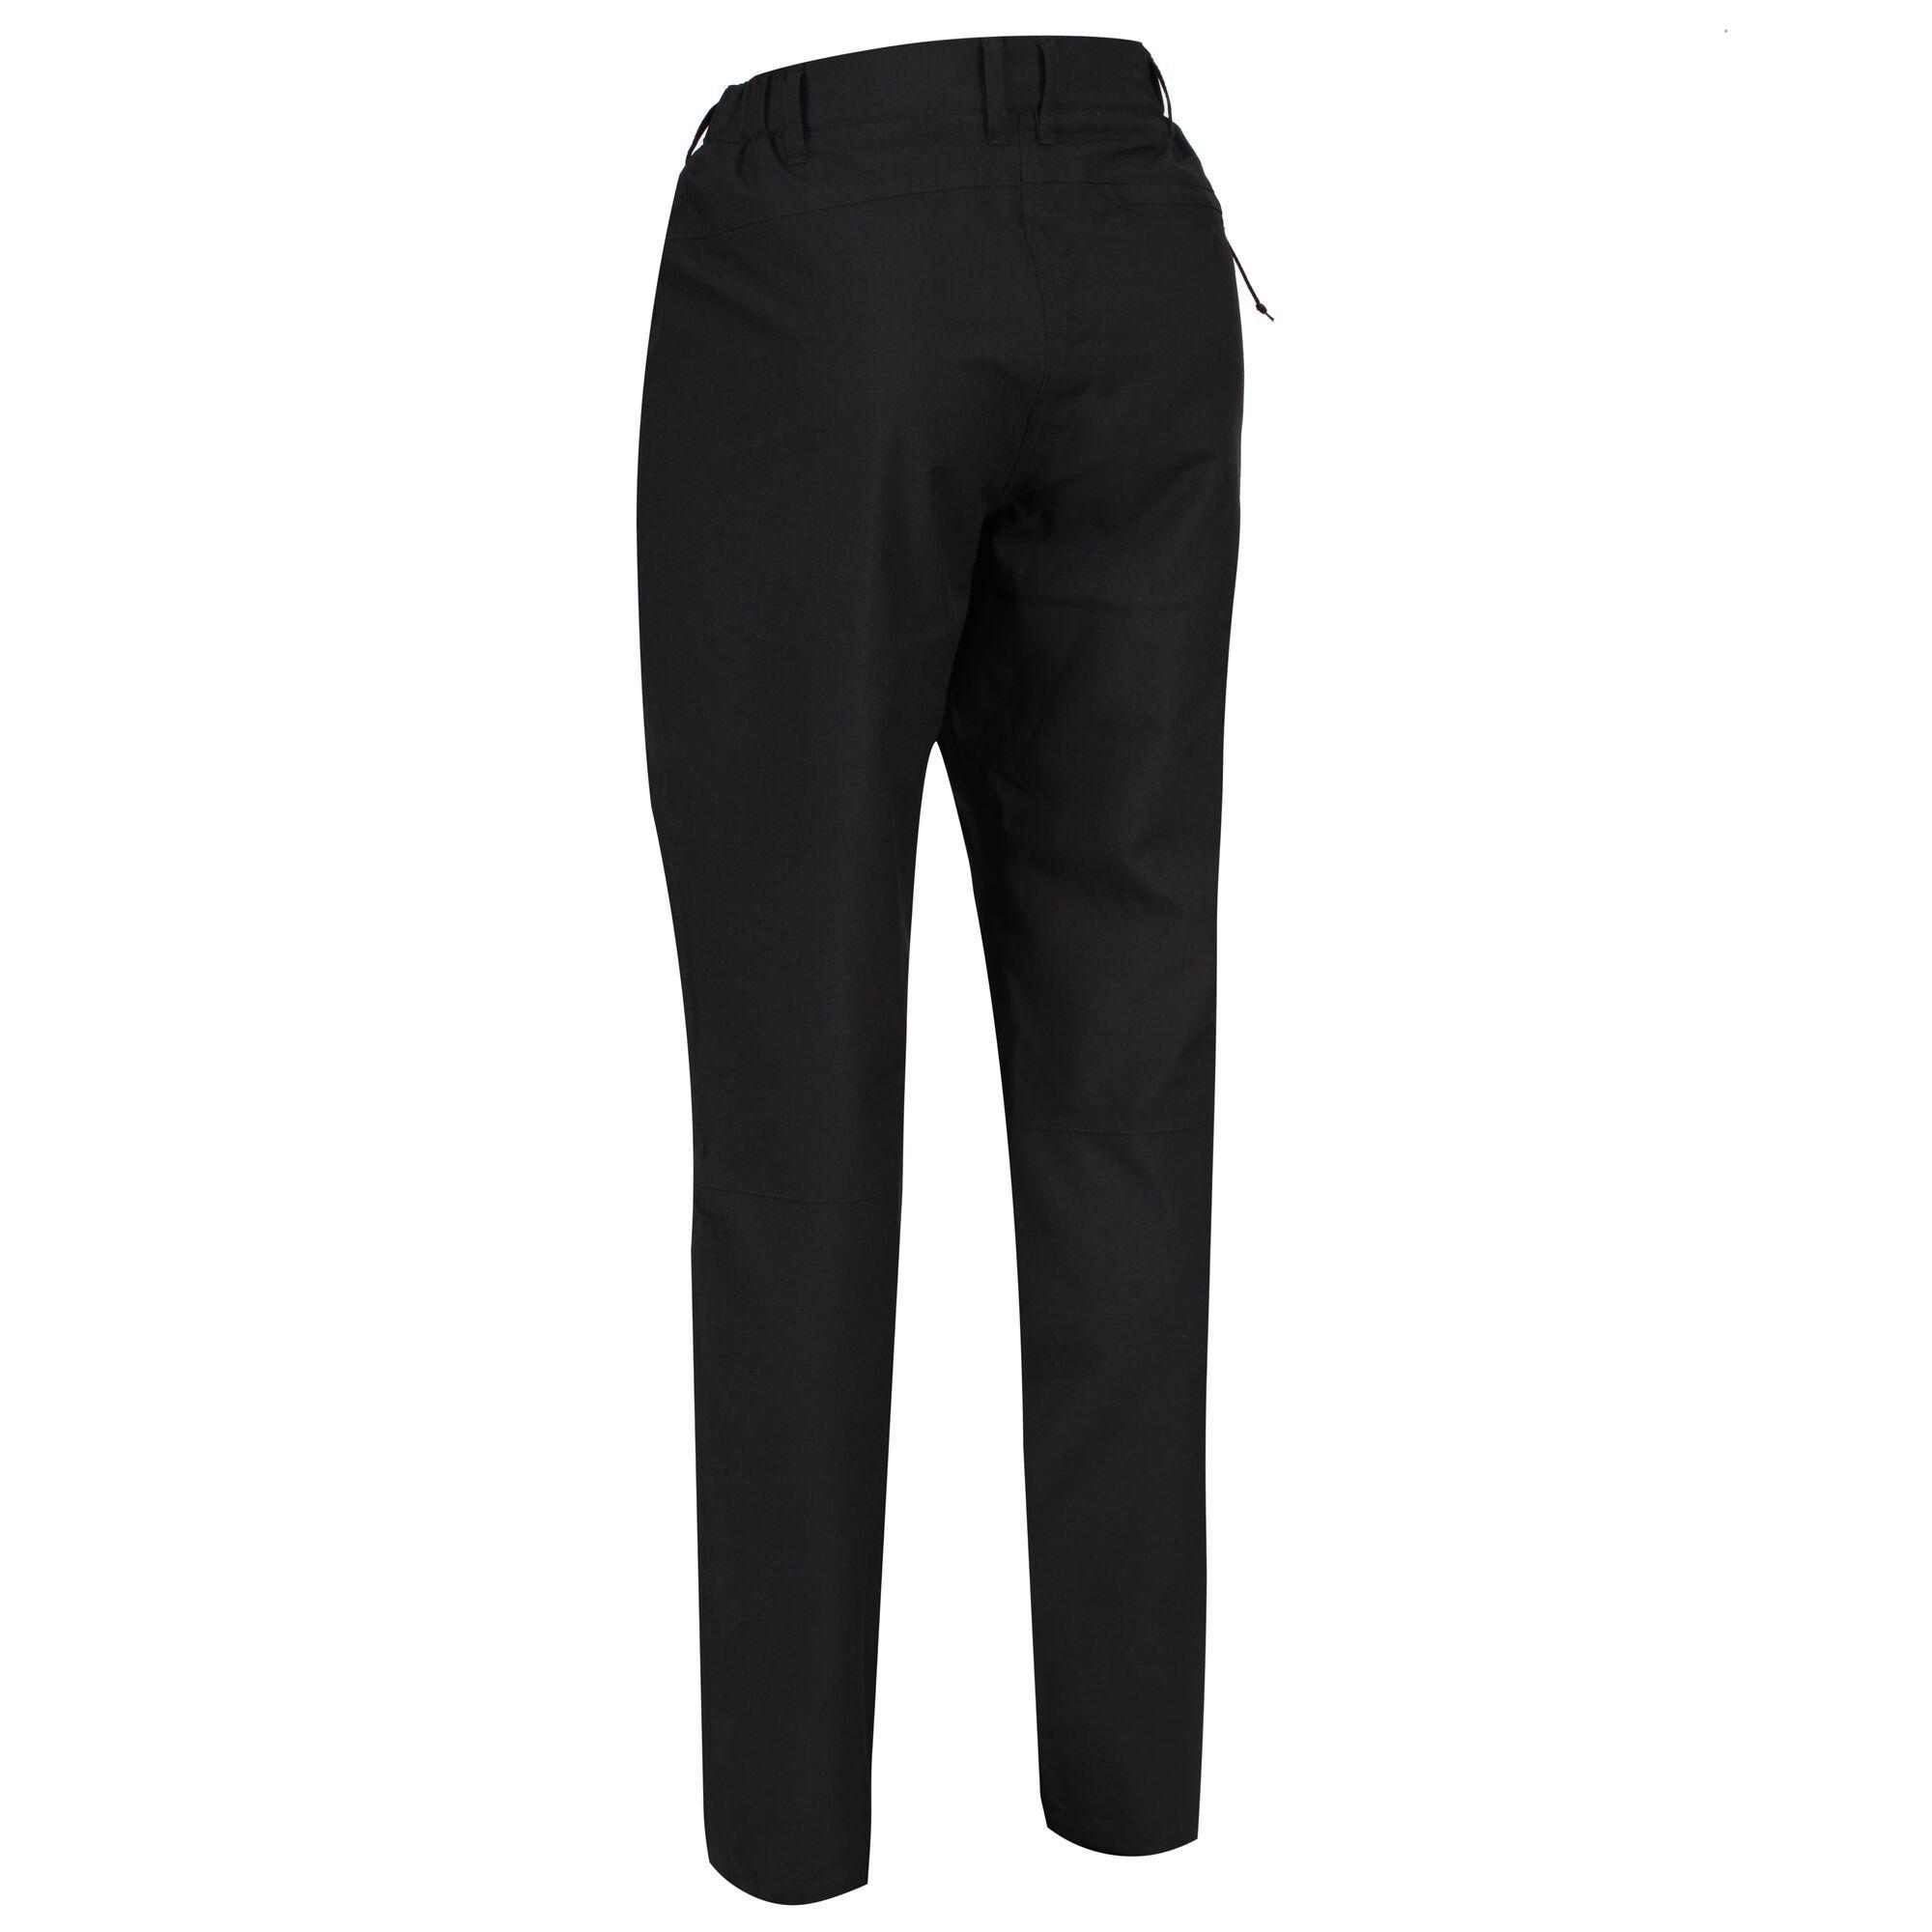 Regatta Great Outdoors Womens/Ladies Dayhike III Water Repellent Trousers